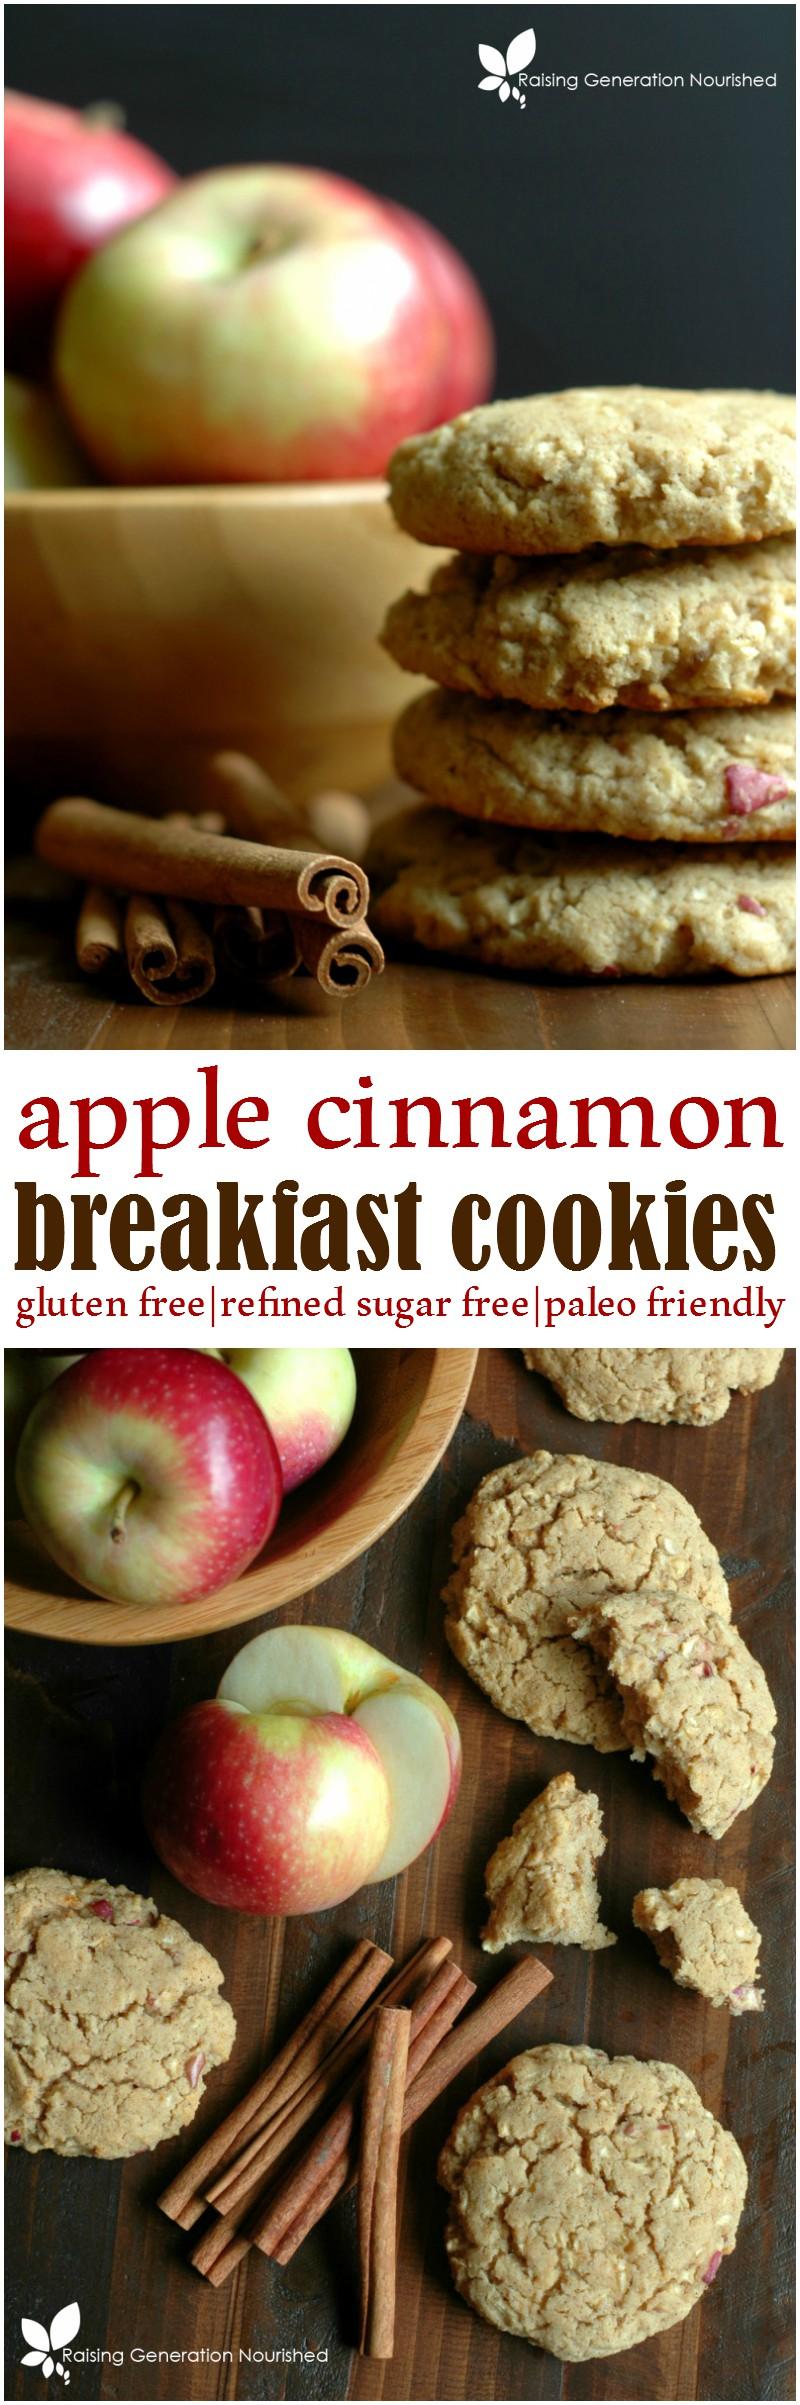 Healthy Apple Cinnamon Breakfast Cookies :: Refined Sugar Free & Gluten Free!